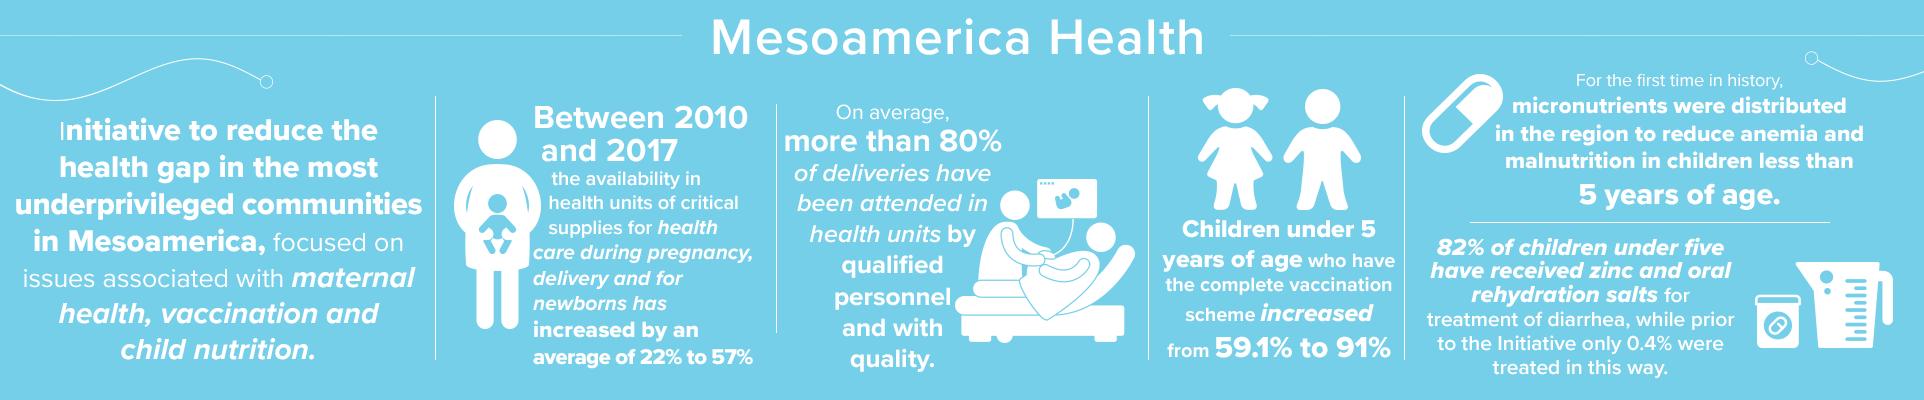 Mesoamerica Health